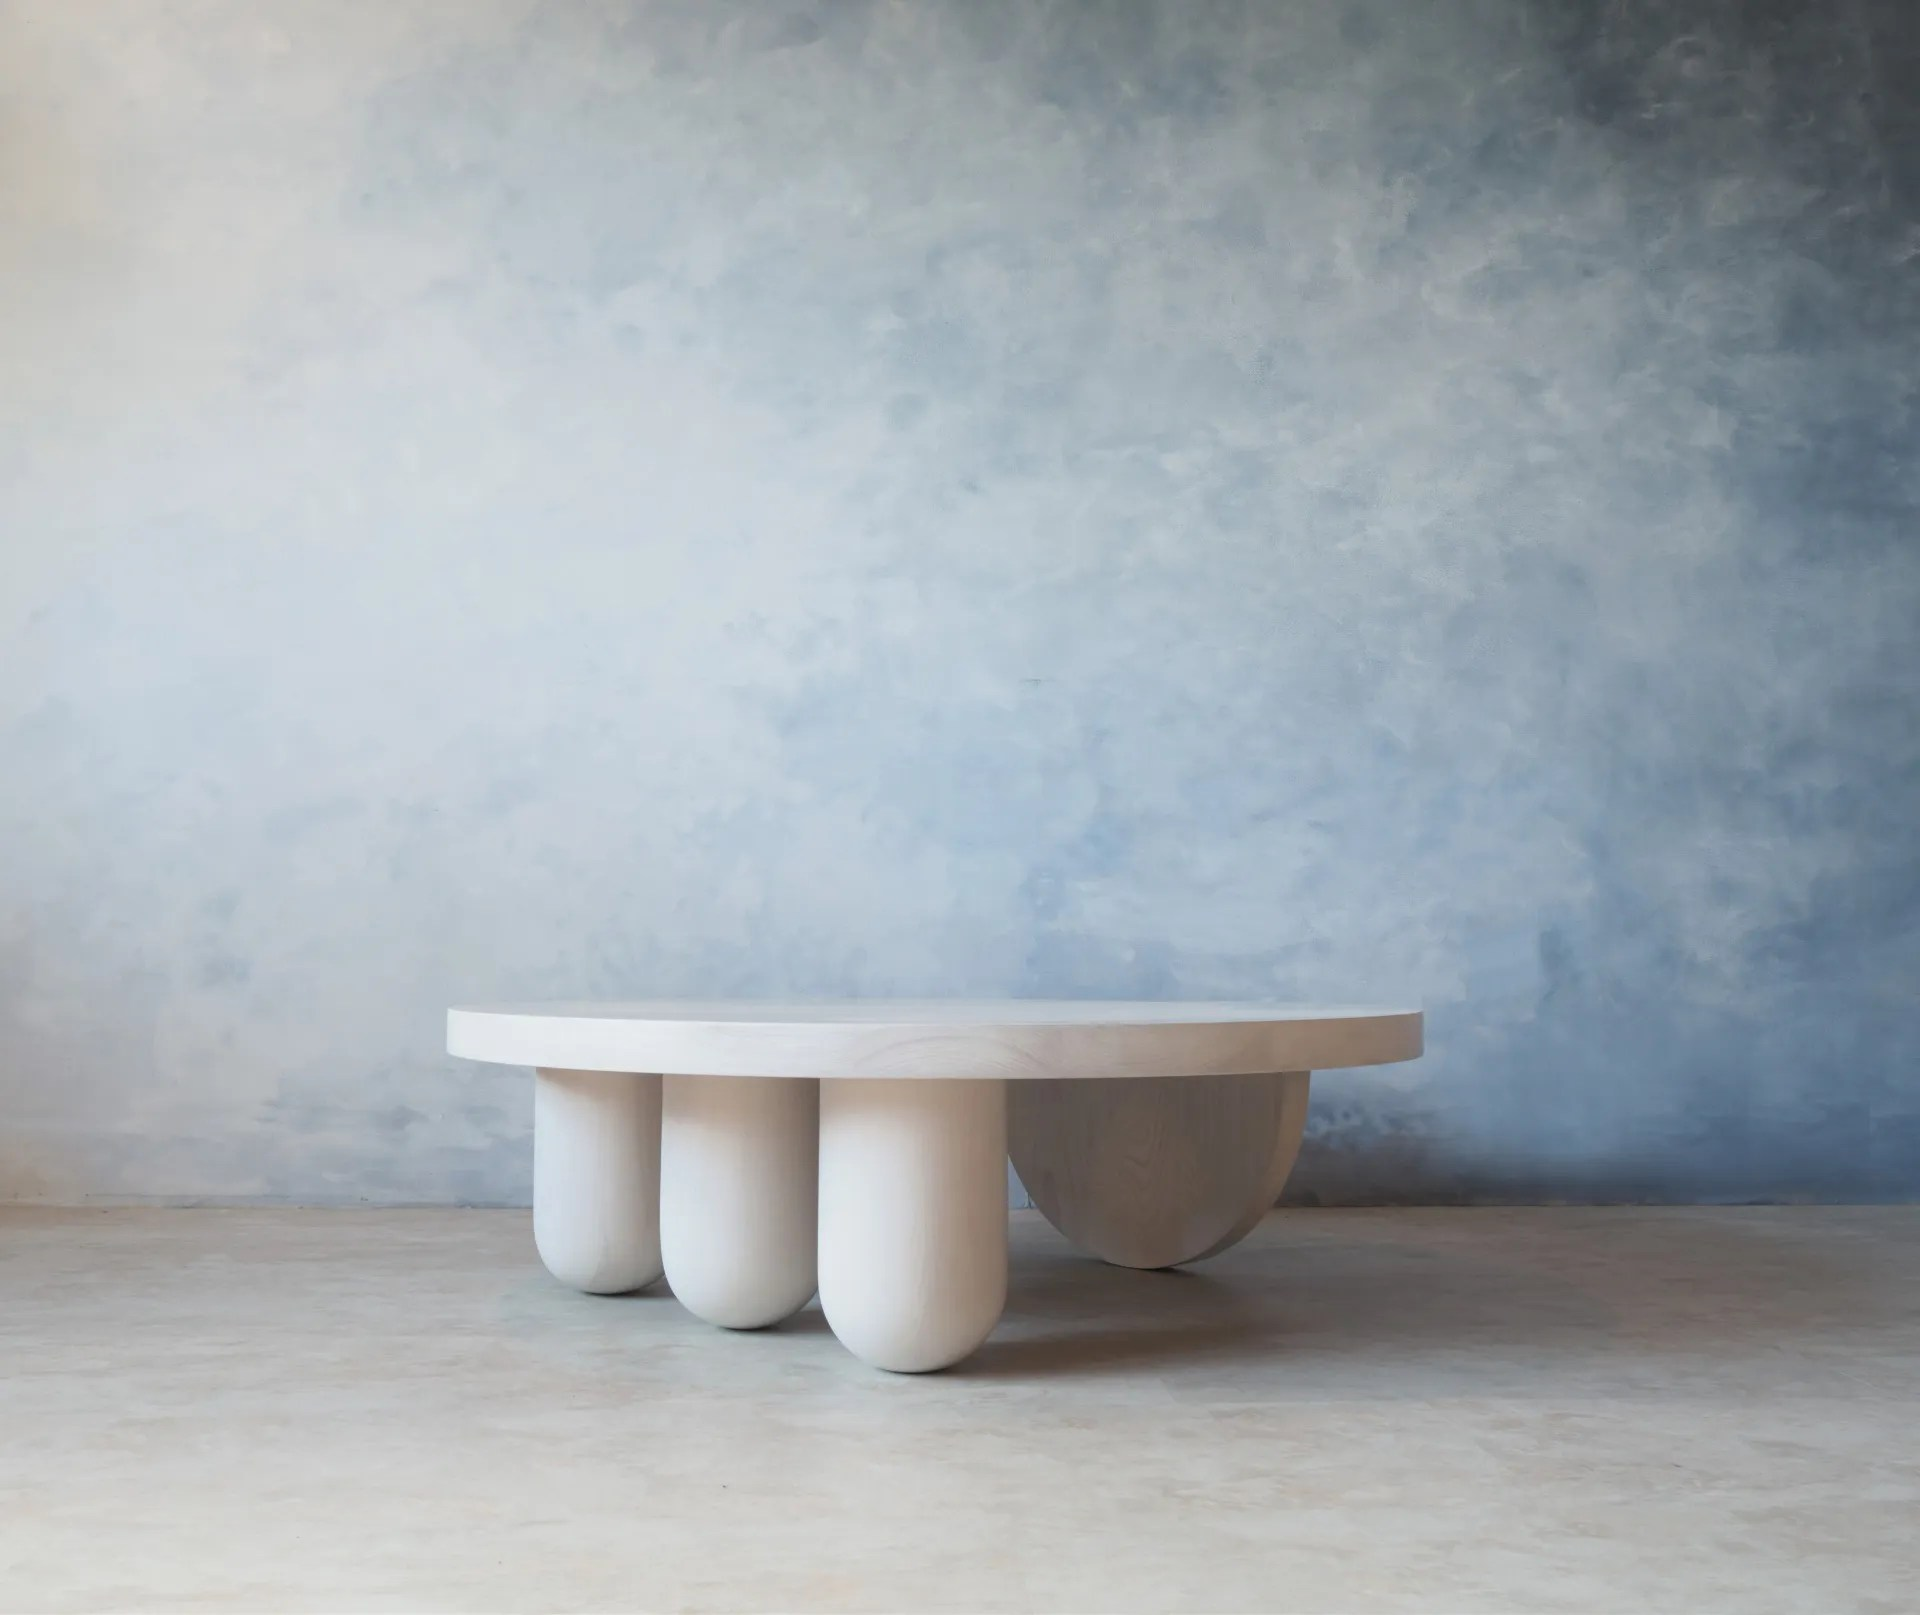 tricolumn coffee table